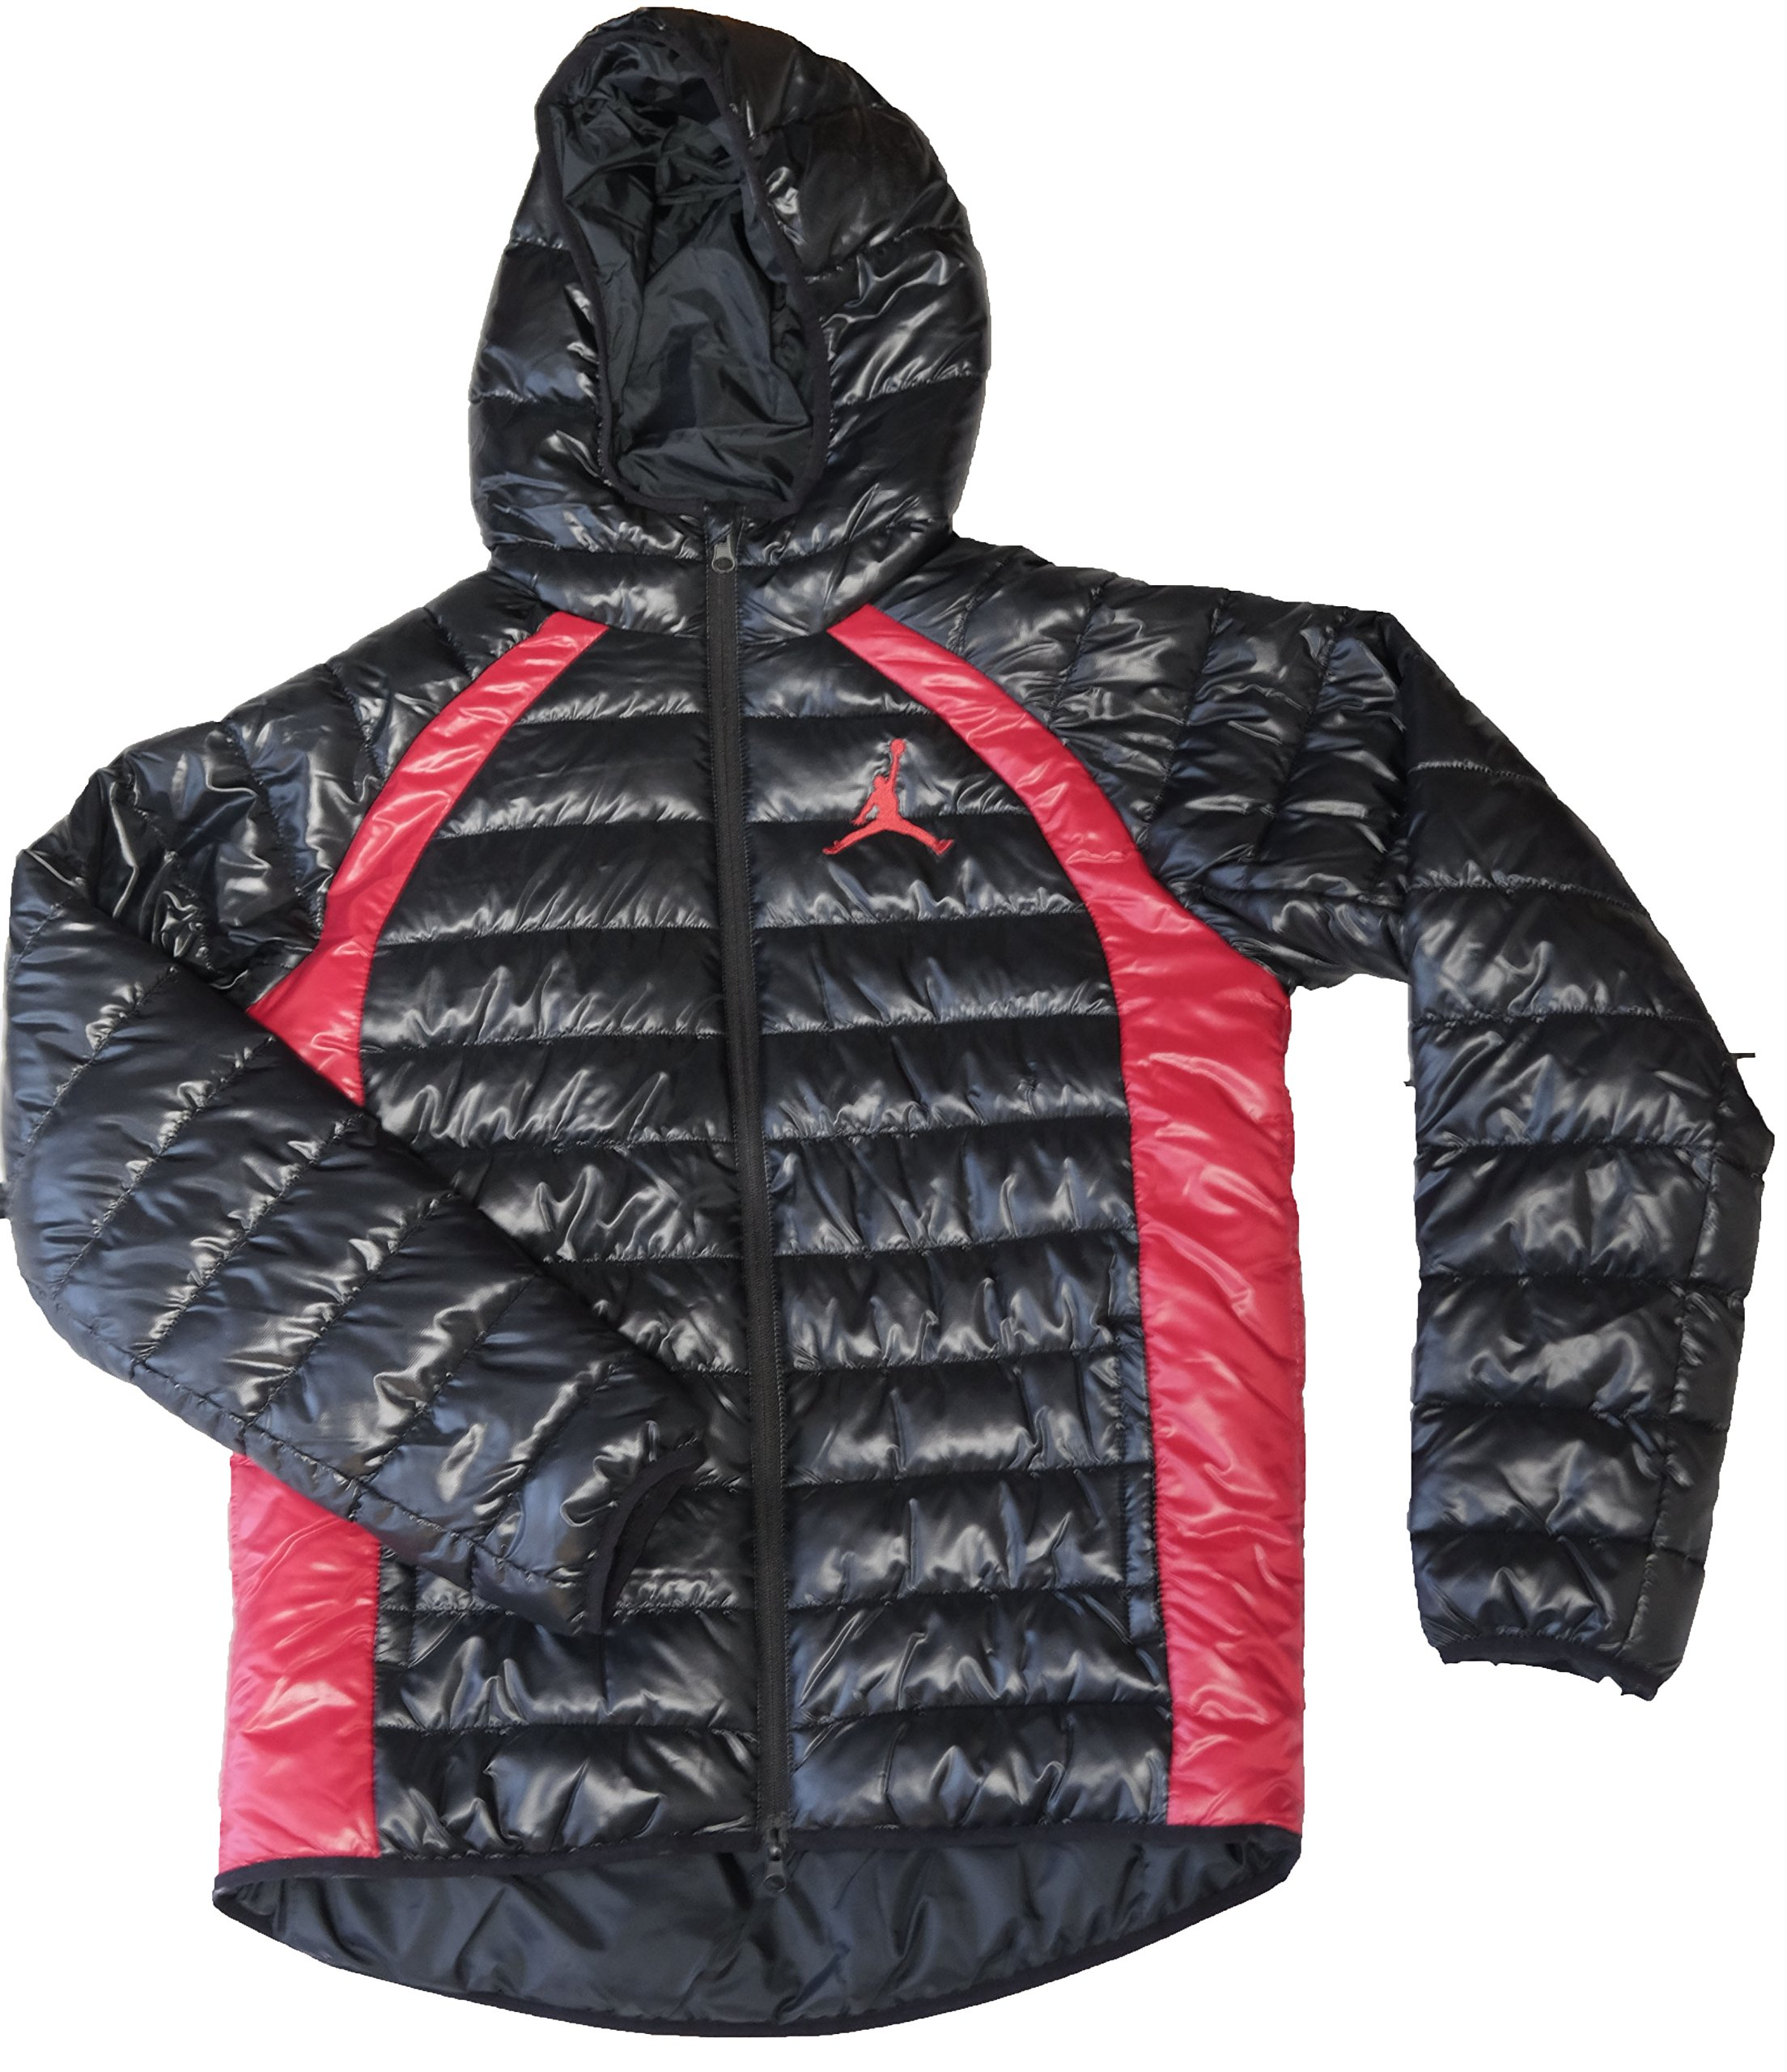 abc8dcd73 Galleon - NIKE Air Jordan Boys Youth Hooded Puffer Jacket, Black/Red -  XLarge